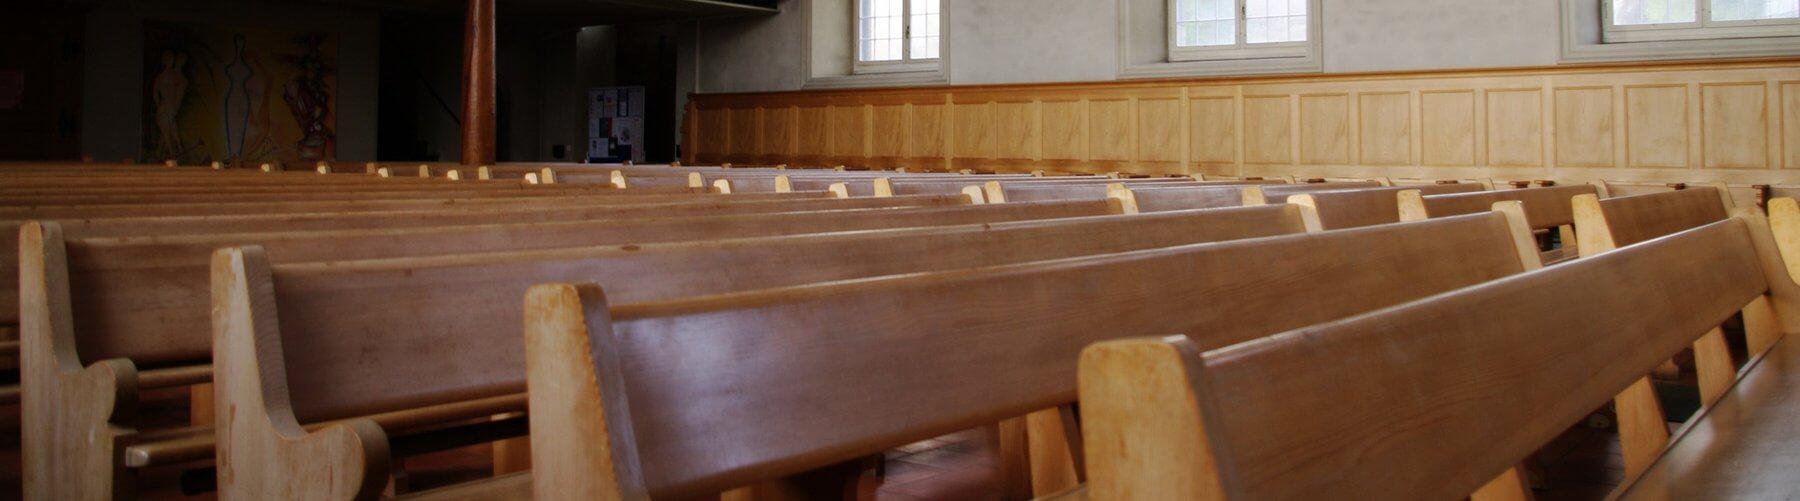 Church Lingo slider image